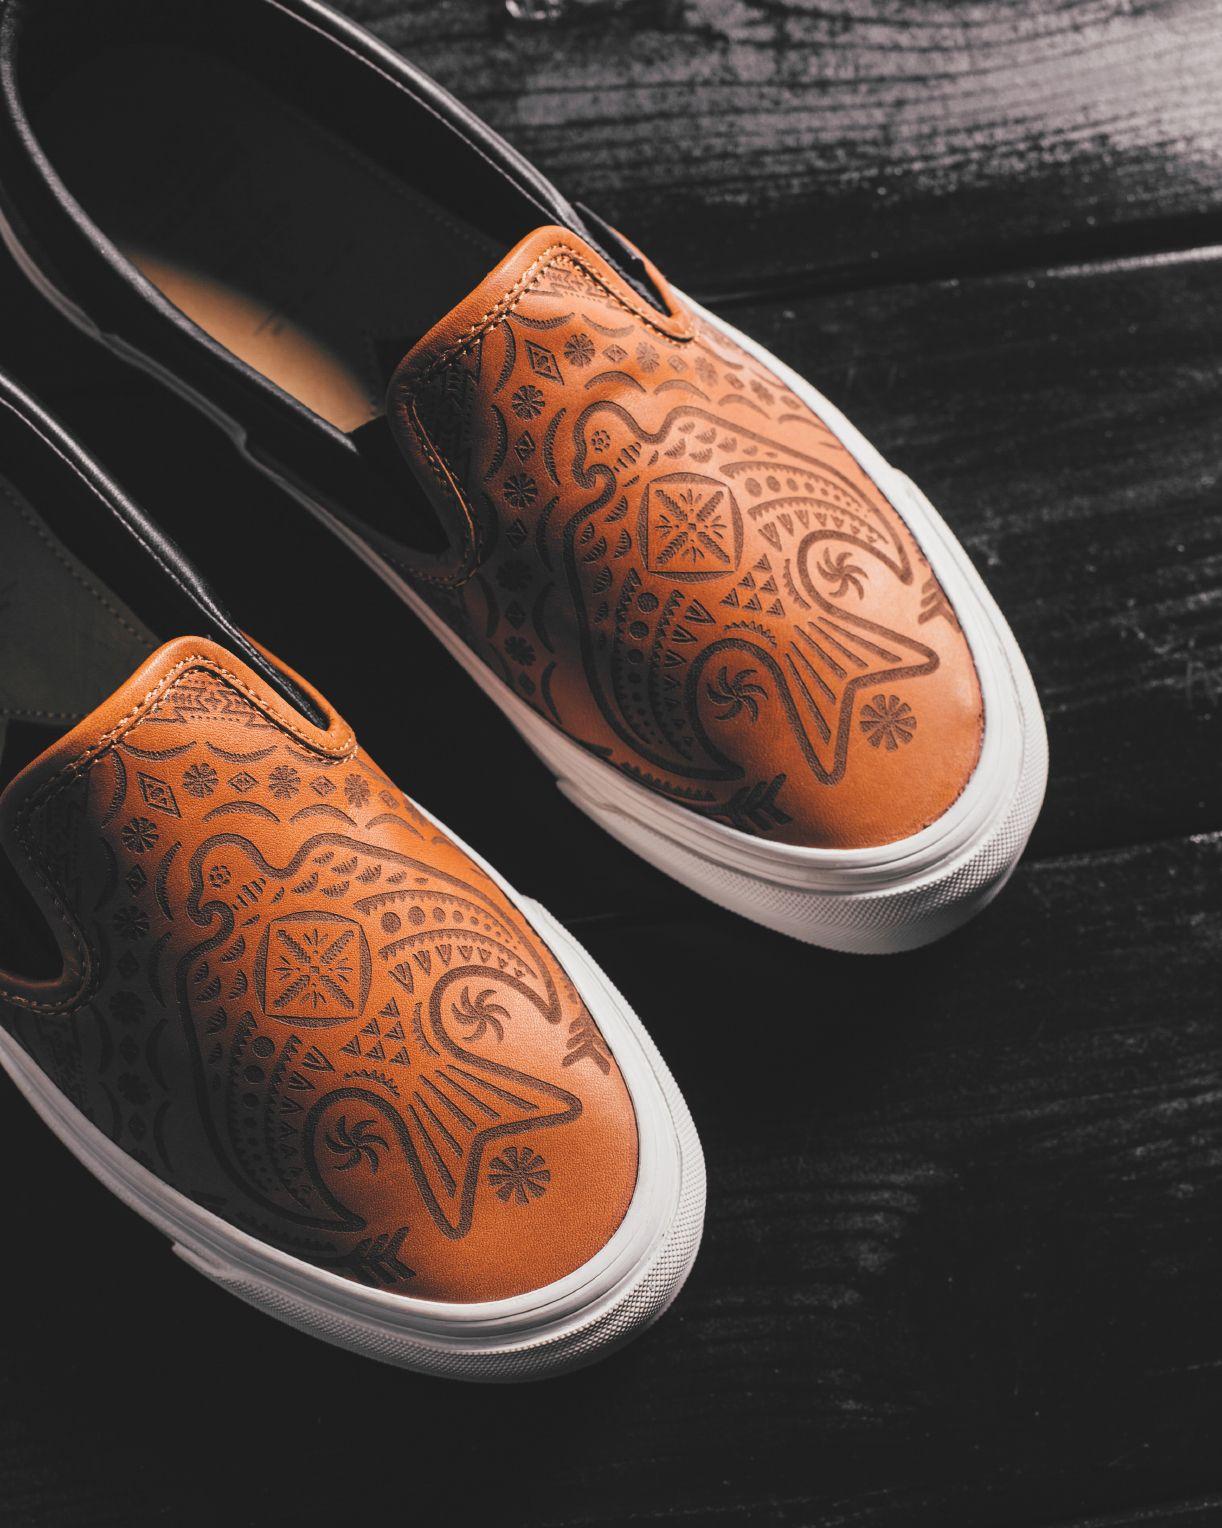 b326db8af5 Vans Vault x Brooks England x Taka Hayashi  VansVault  Brooks  TakaHayashi   Fashion  Streetwear  Style  Urban  Lookbook  Photography  Footwear   Sneakers ...